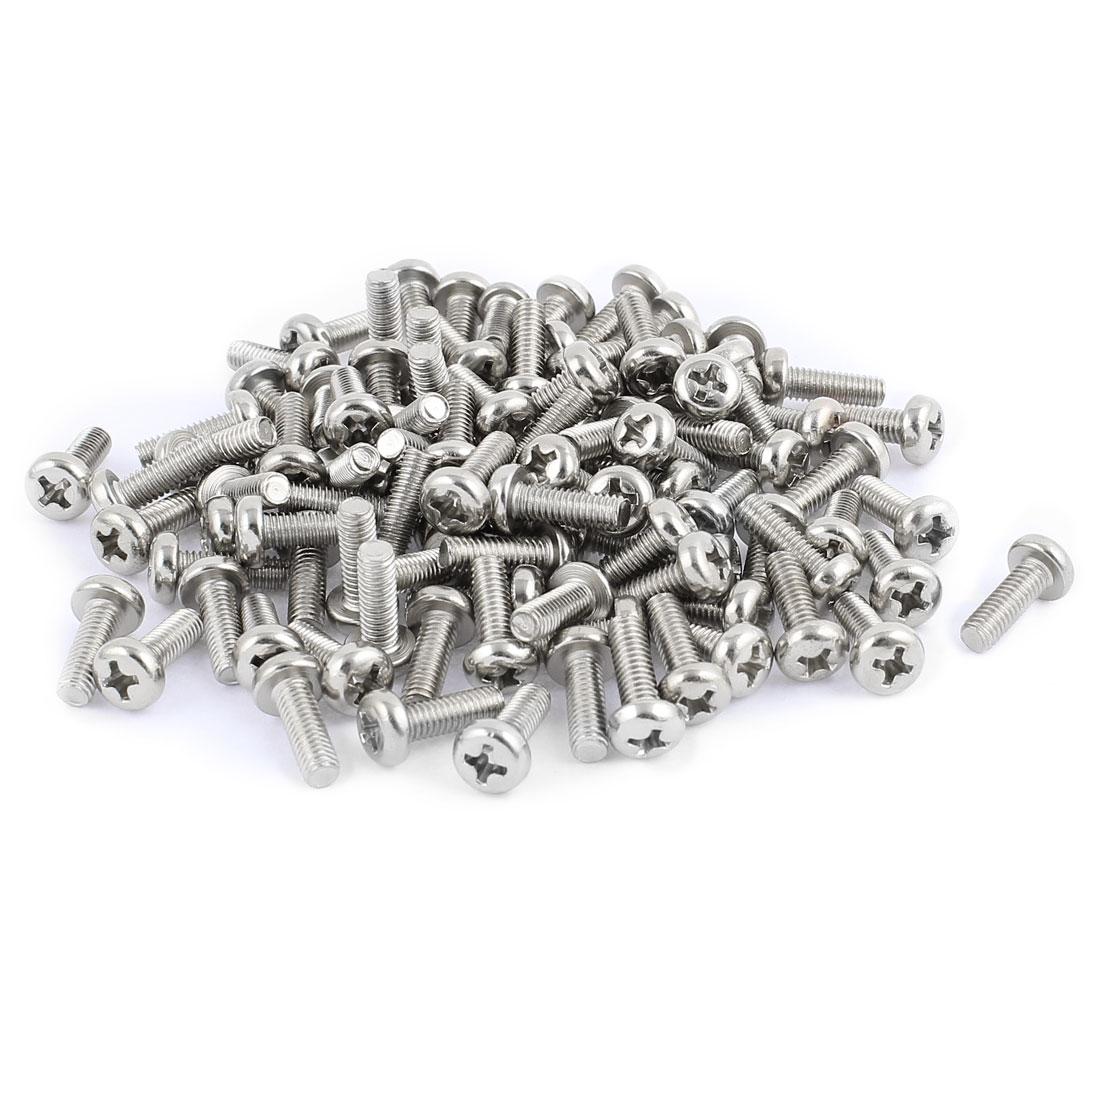 100 Pcs M4x12mm Stainless Steel Round Head Phillips Machine Screws Bolts